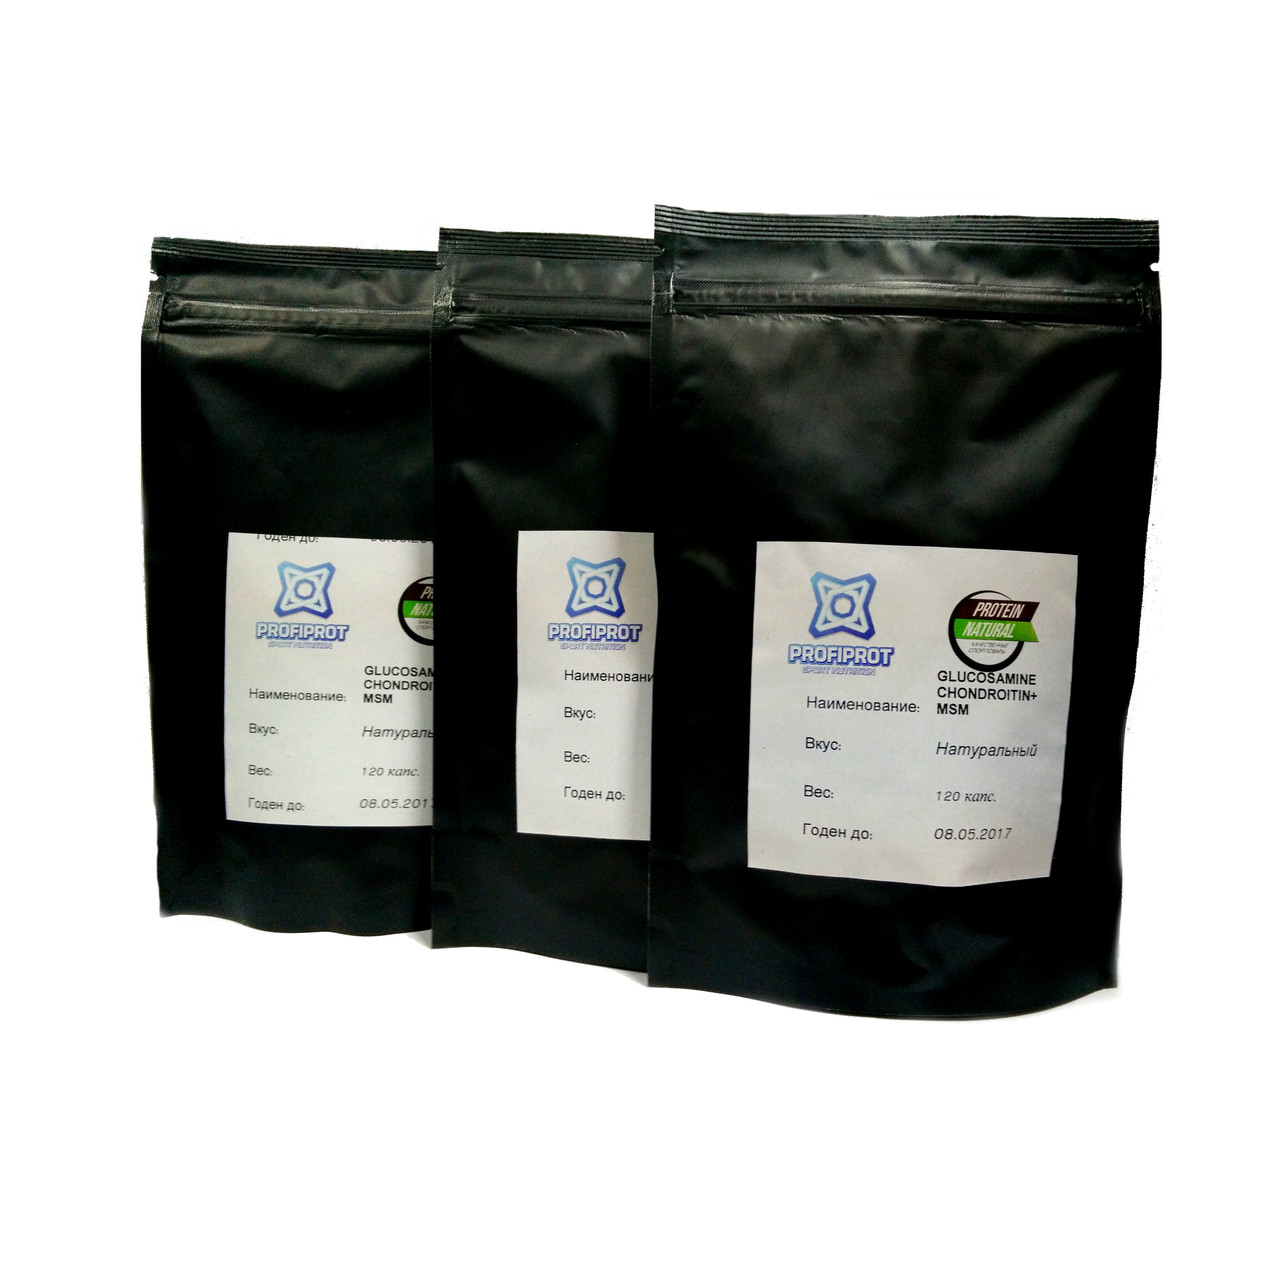 Для суставов GLUCOSAMINE & CHONDROITIN + MSM PROFIPROT, 120 капс * 850мг